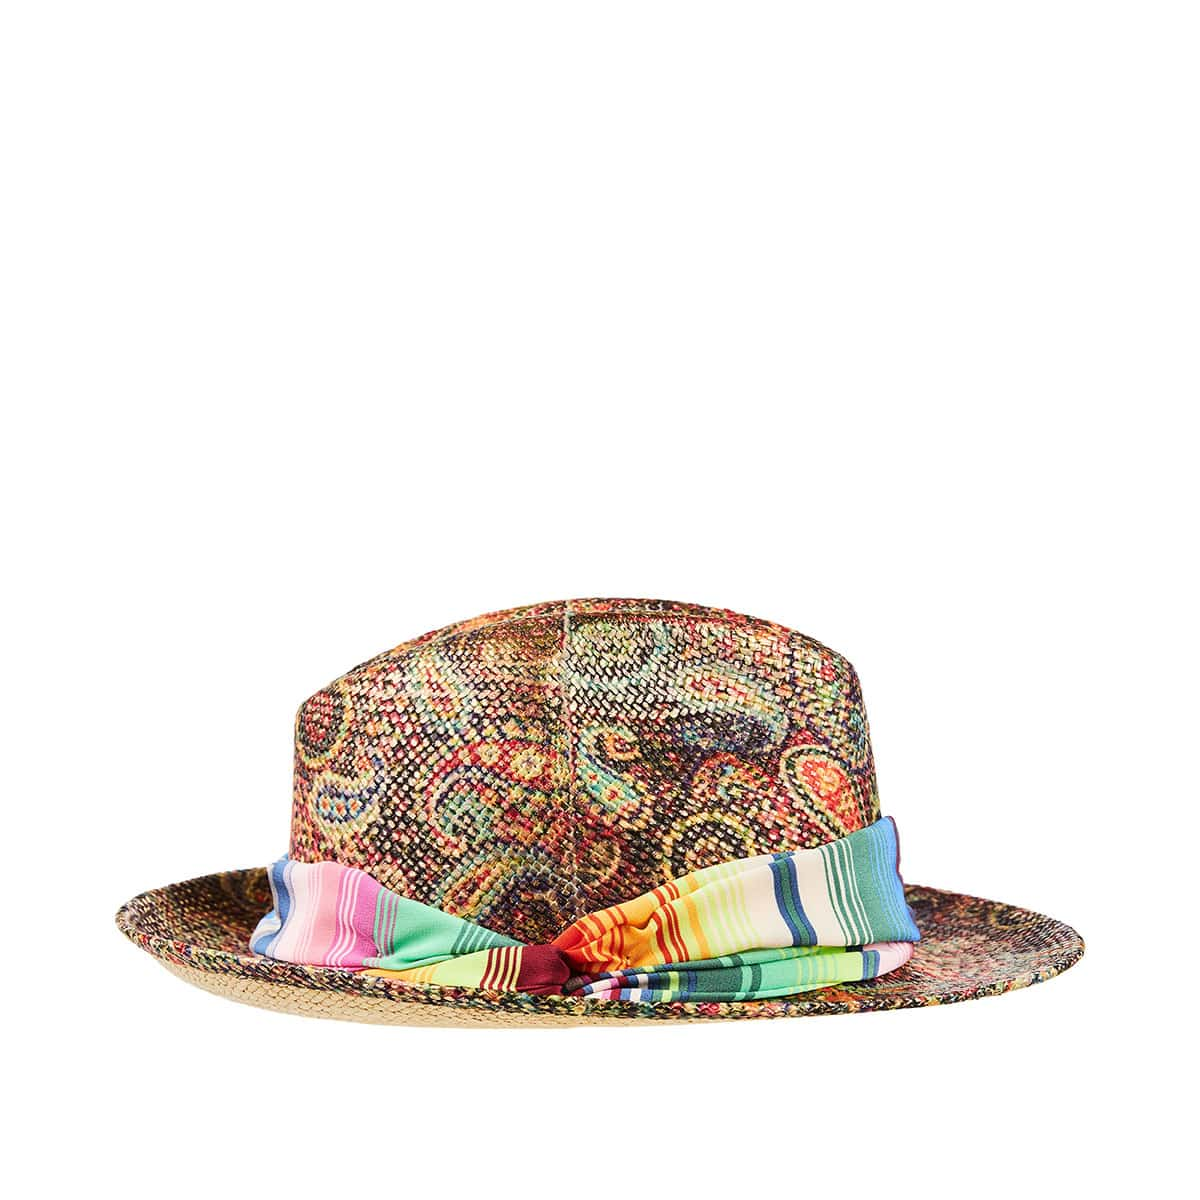 Paisley print straw hat